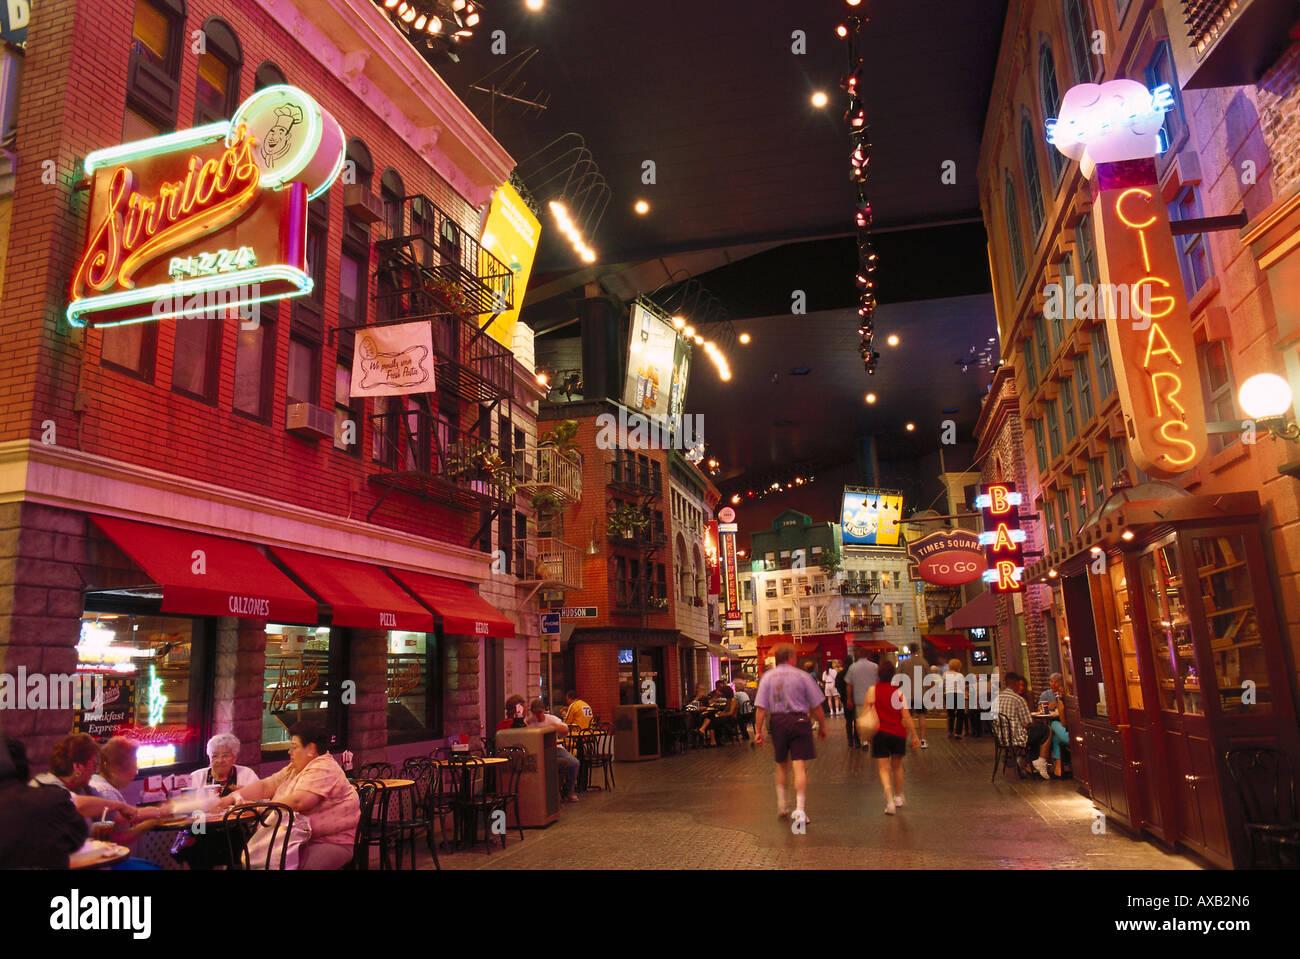 Monte Carlo New York City Restaurant